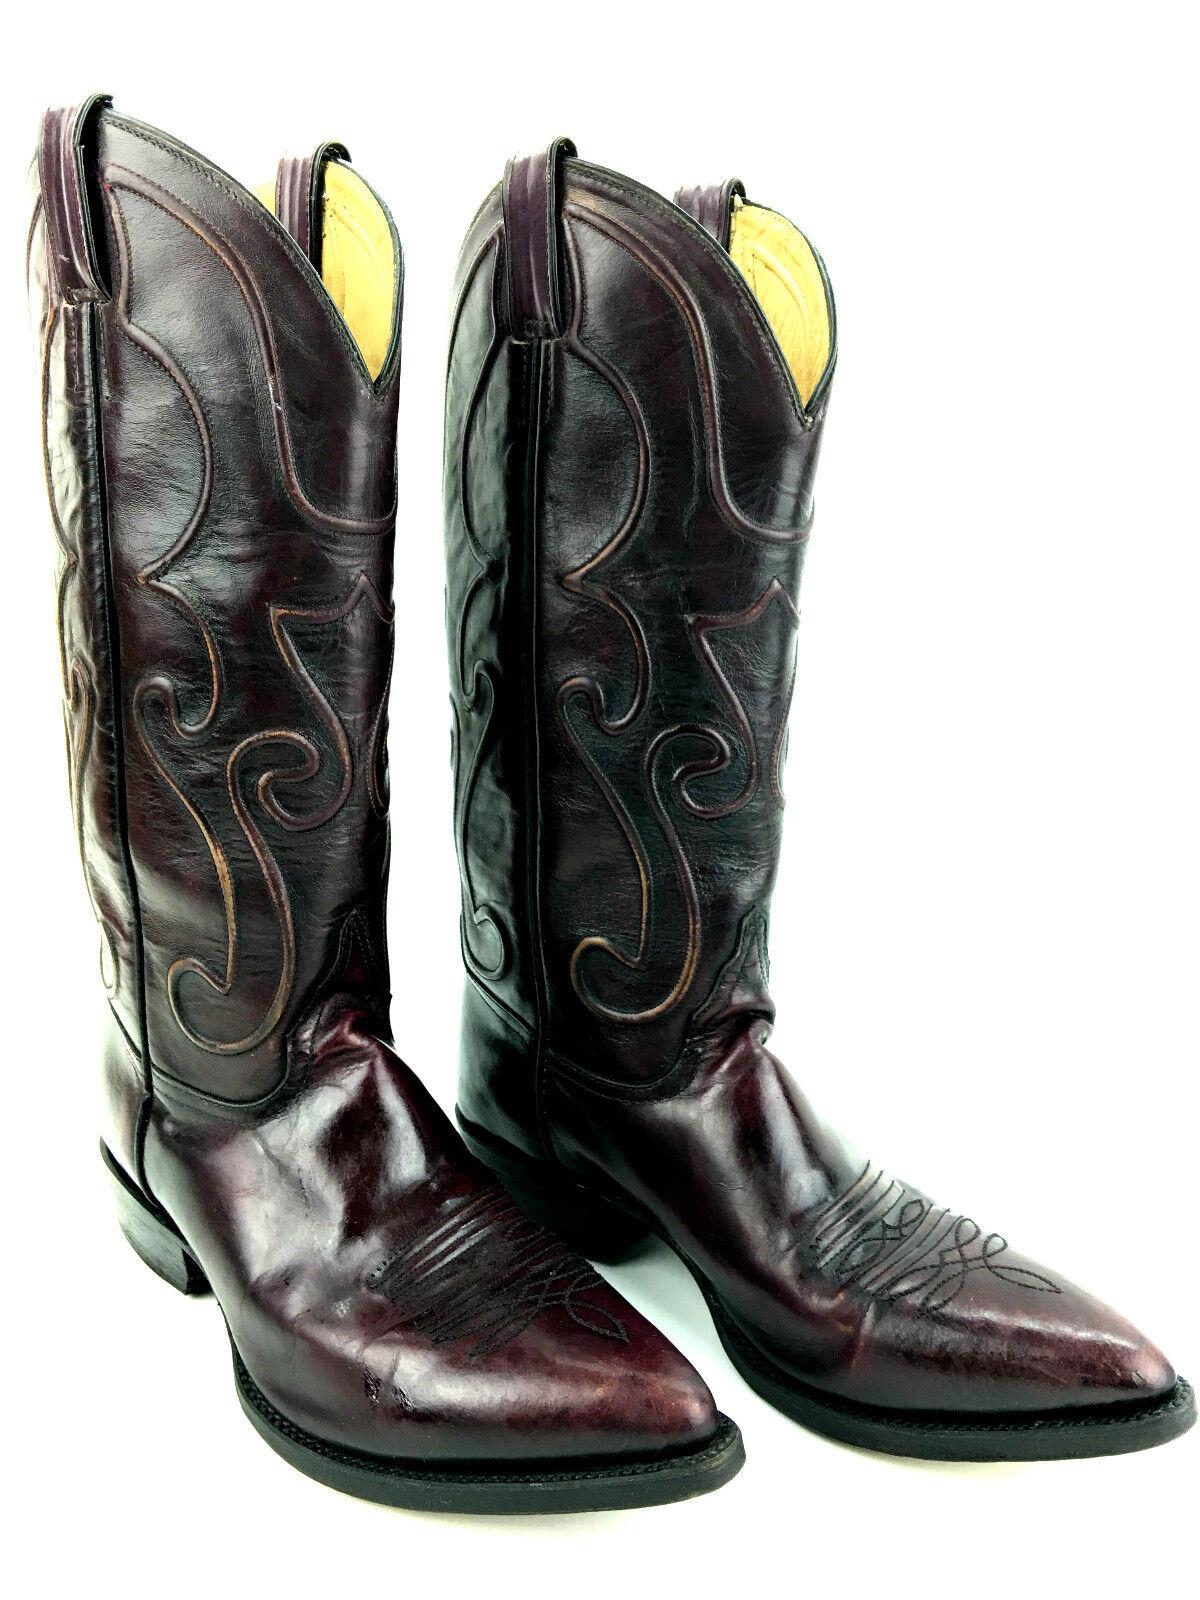 Morgan & Miller Men's Burgundy Western Cowboy Boots Size 7.5 USA.